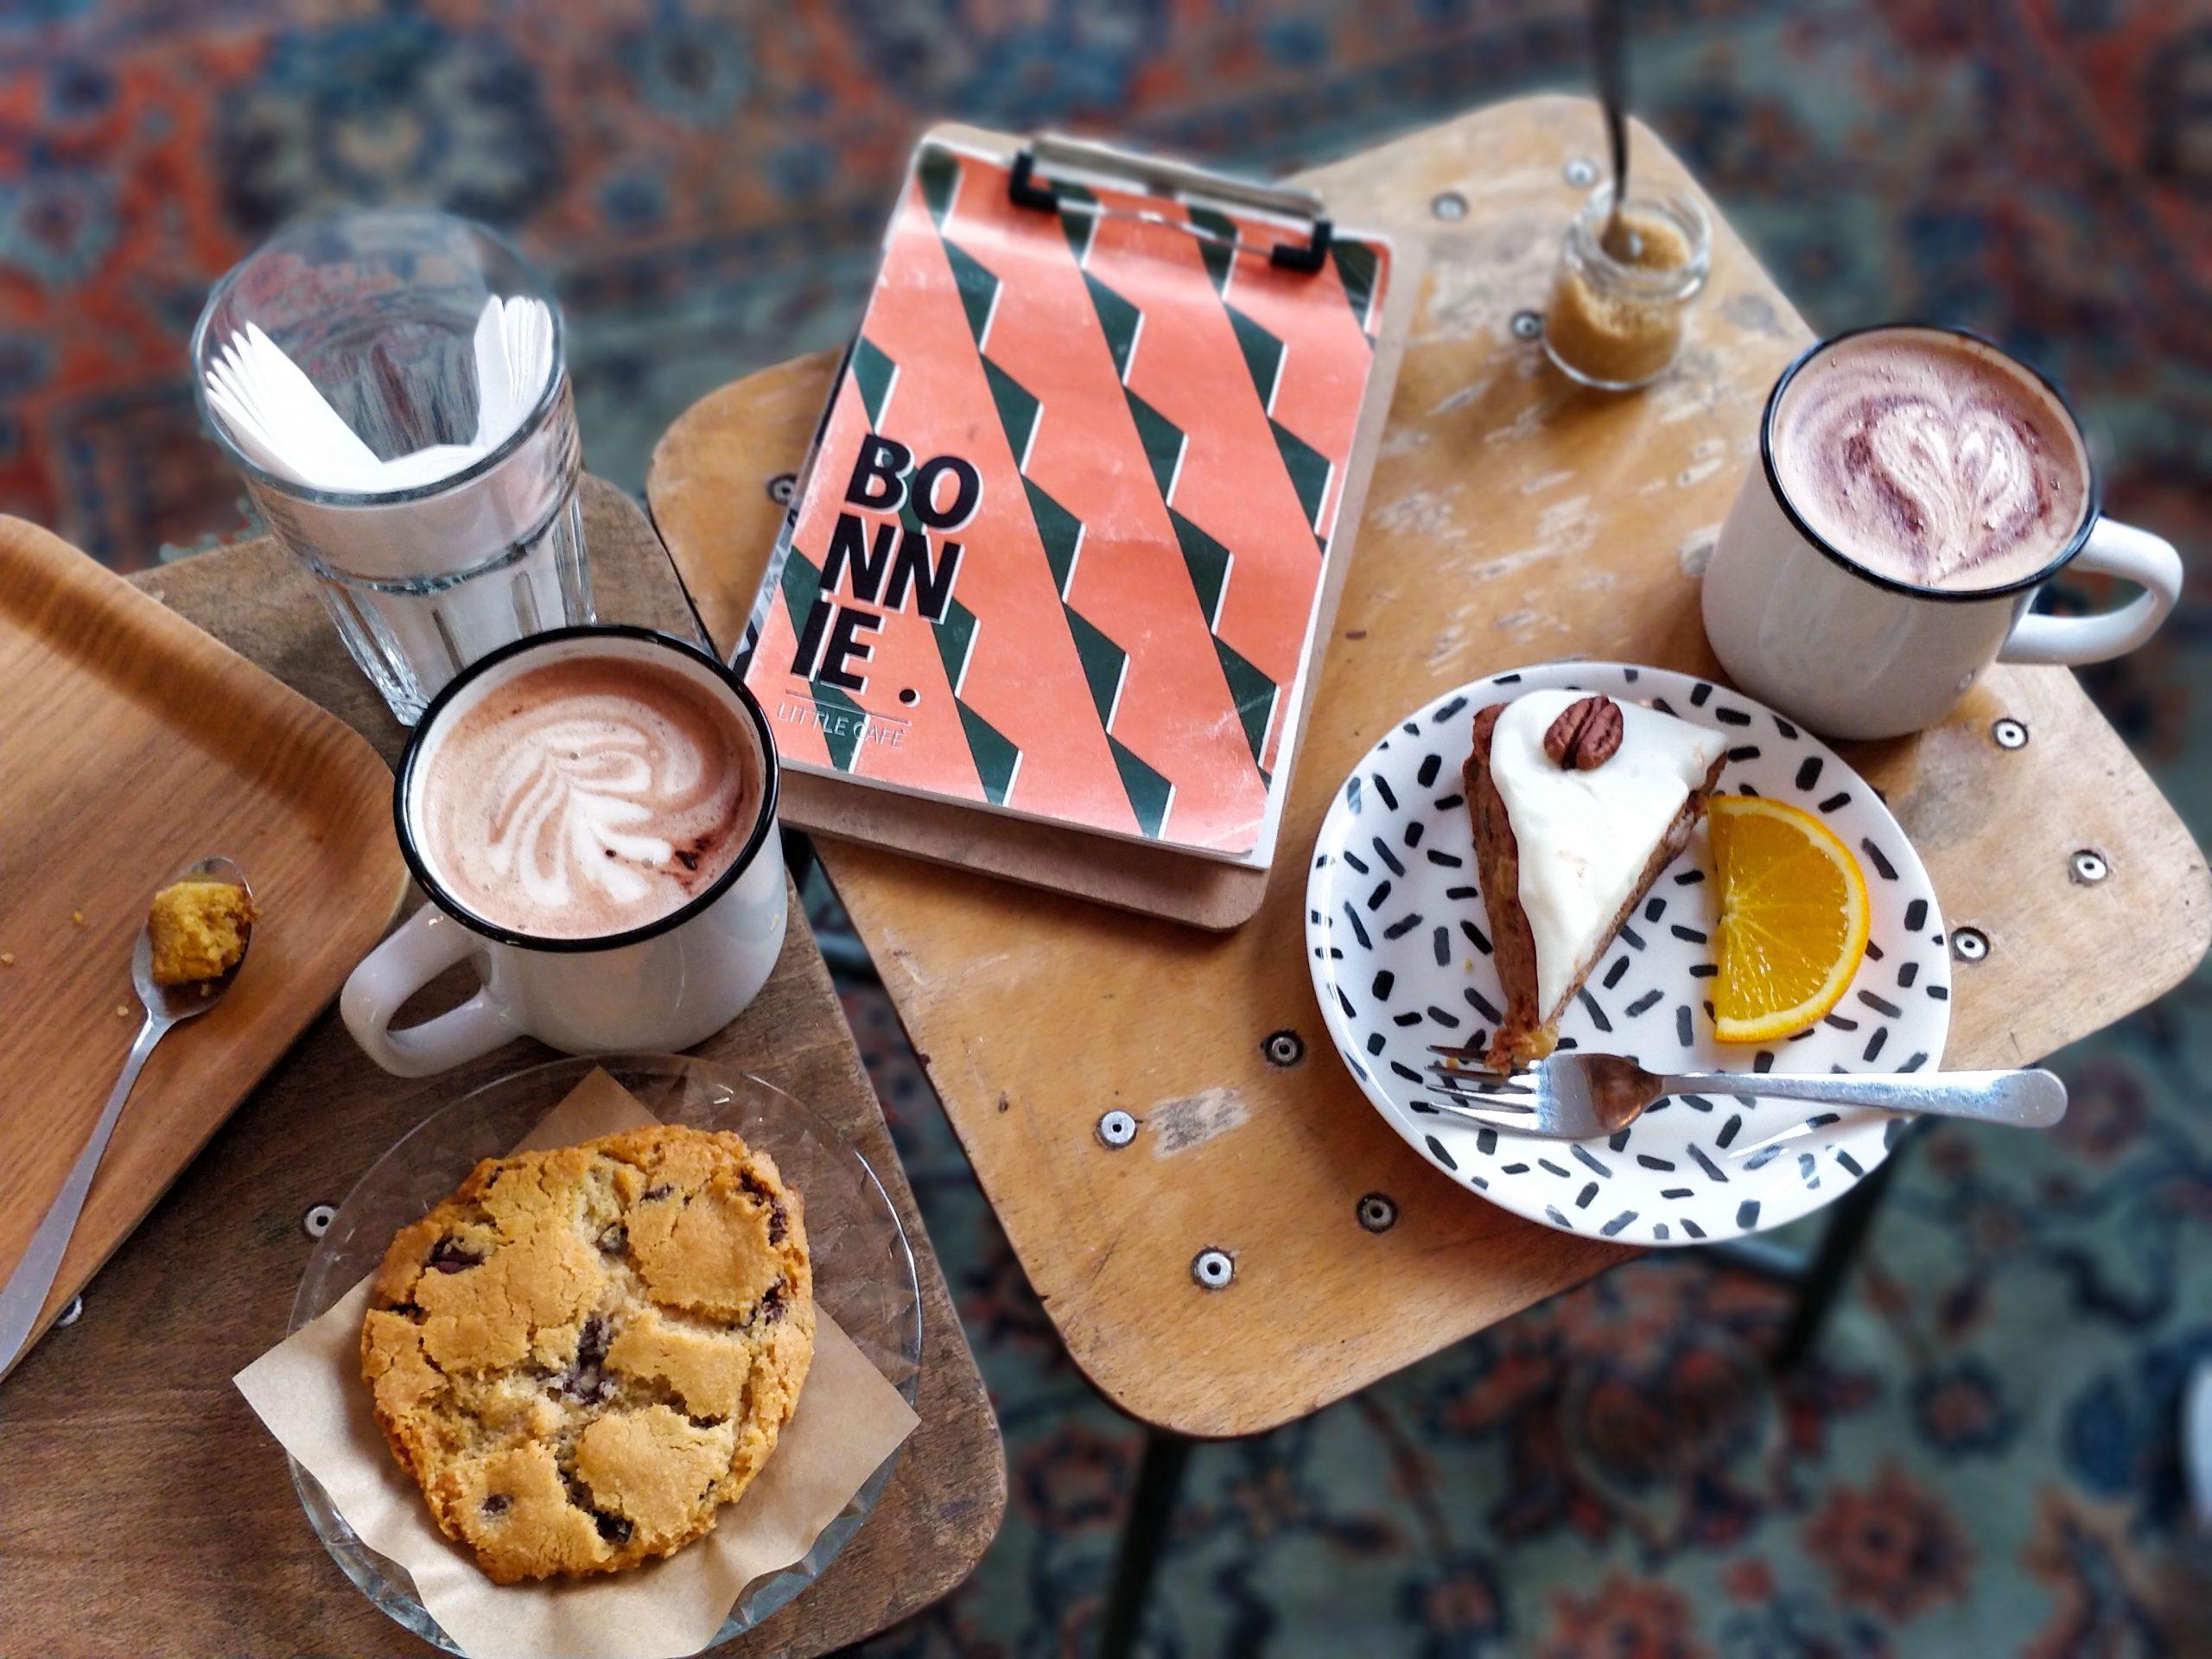 Bonnie – A little vegan cafe in Arnhem